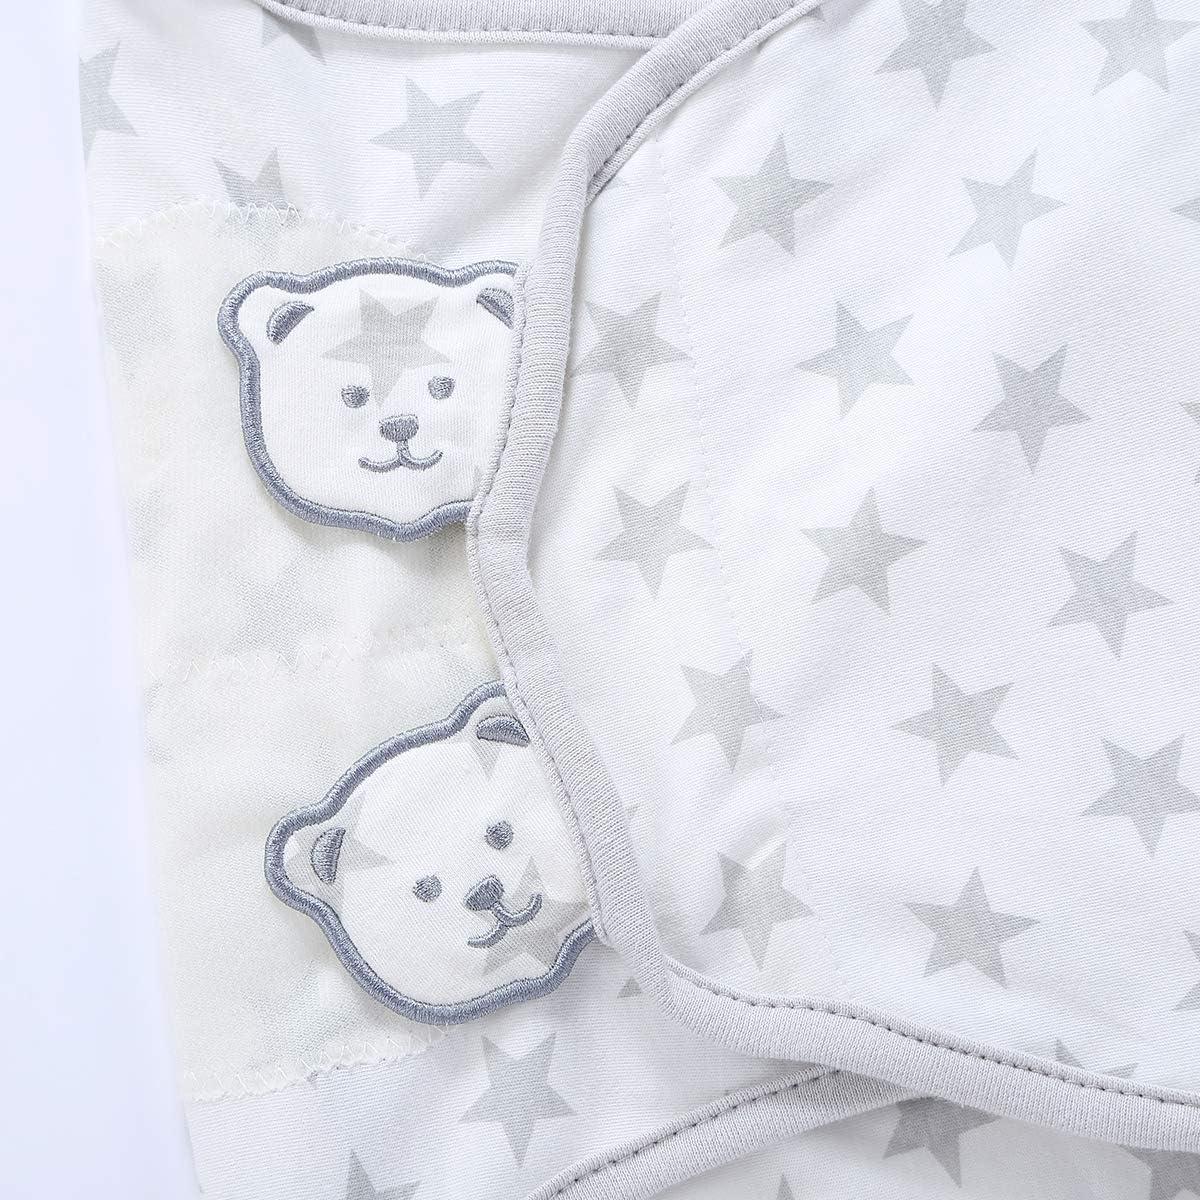 Wanshop/® Pelele para reci/én nacido beb/é ni/ñas ni/ños de franela Mono de forro polar de dibujos animados Pijamas para ni/ños c/álidos pijama de 0 a 18 meses